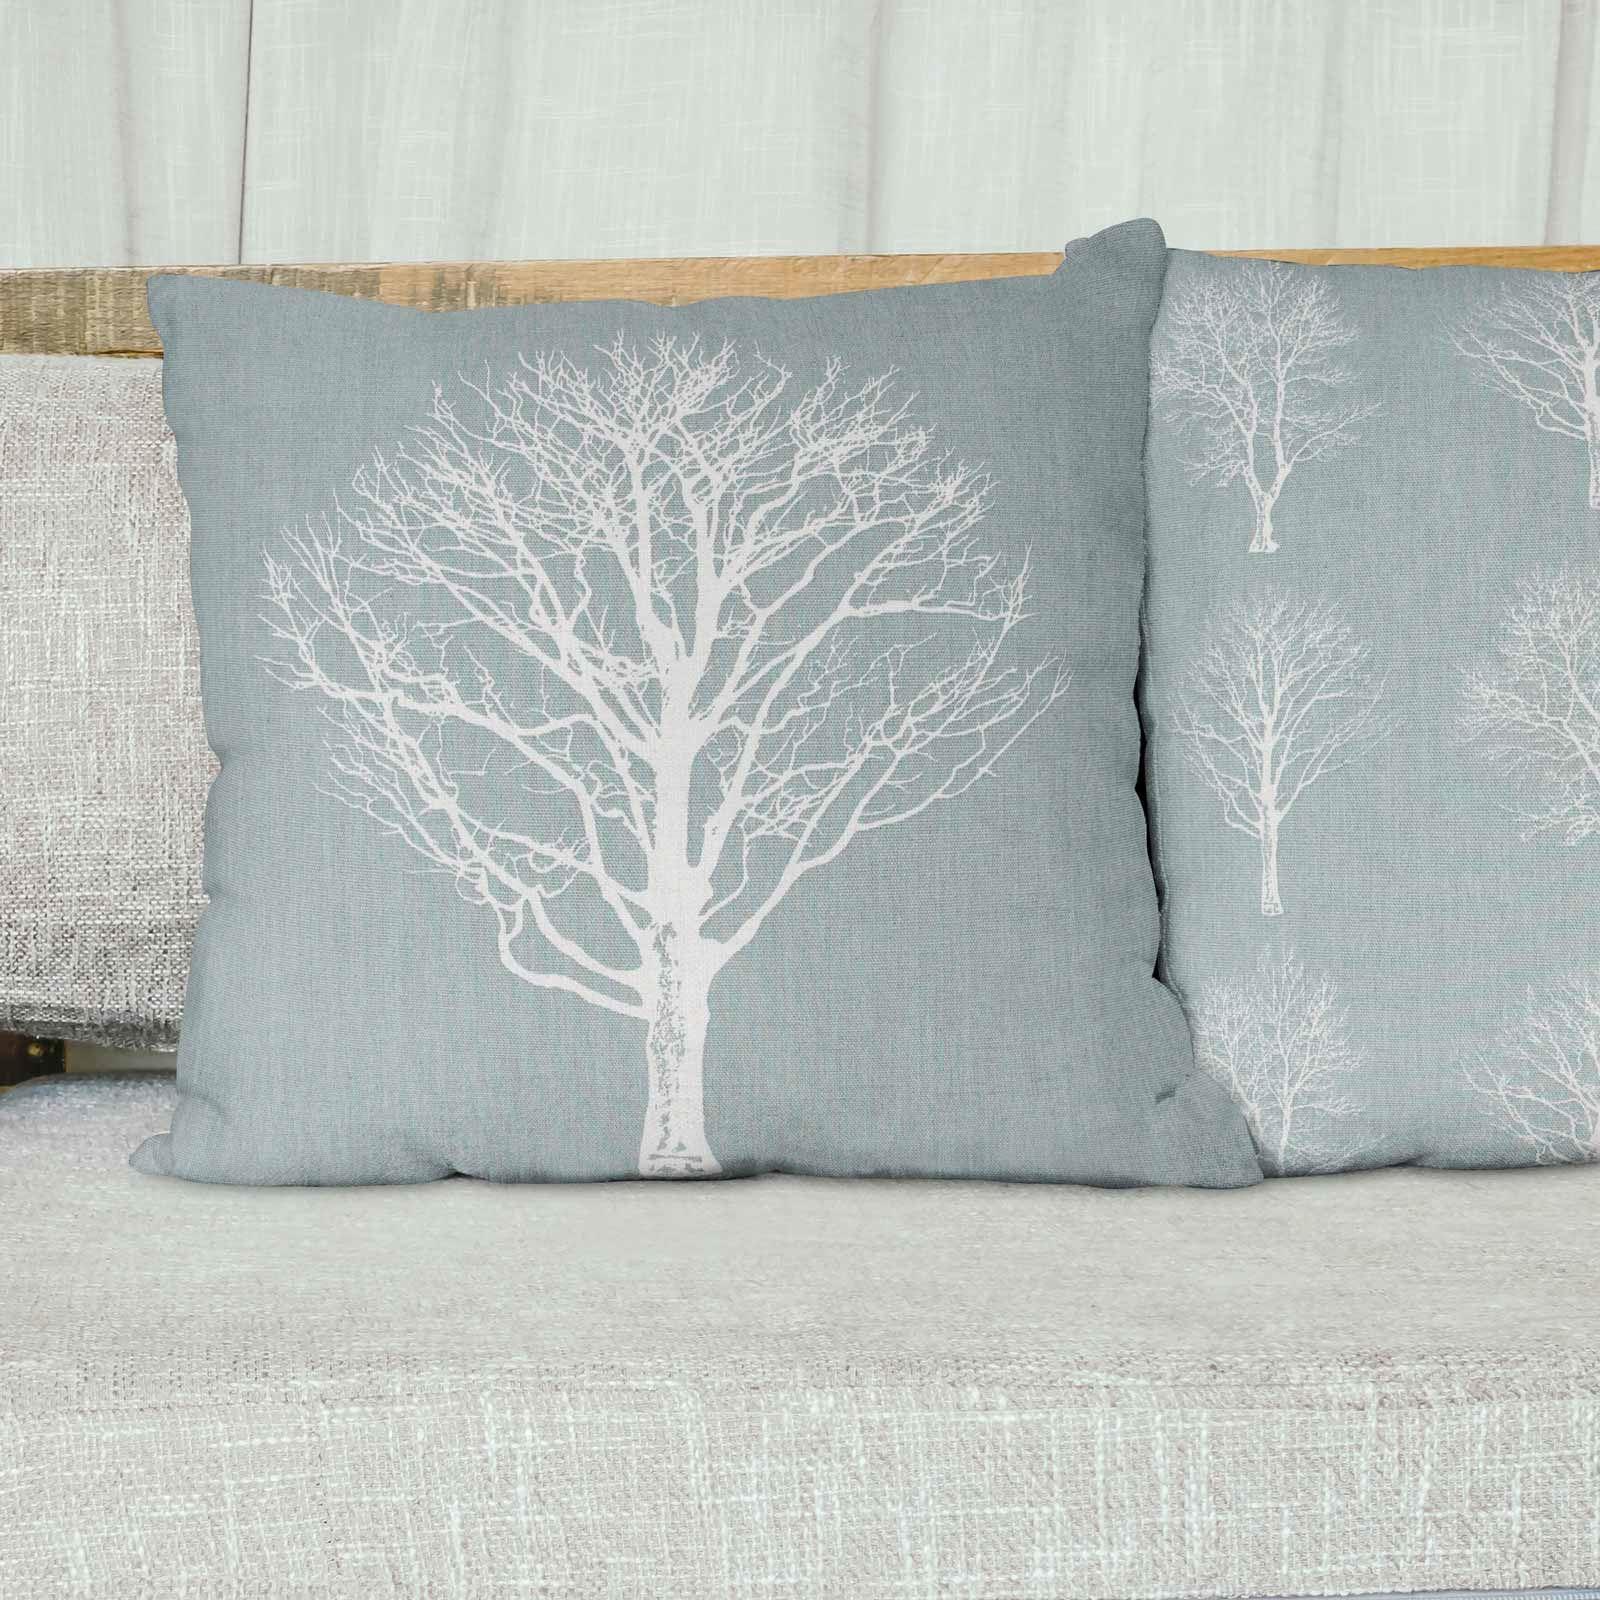 Teal-Blue-Duck-Egg-Cushion-Covers-18-034-x18-034-45cm-x-45cm-Luxury-Cover thumbnail 57